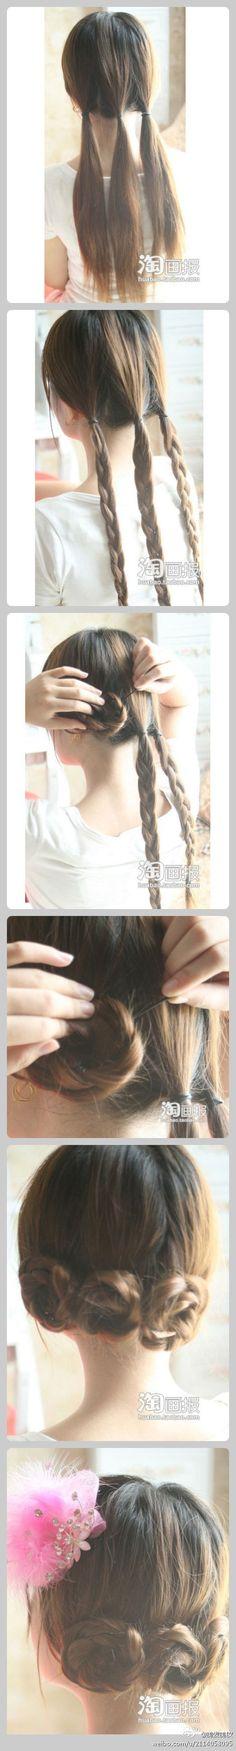 DIY Roses in the Hair